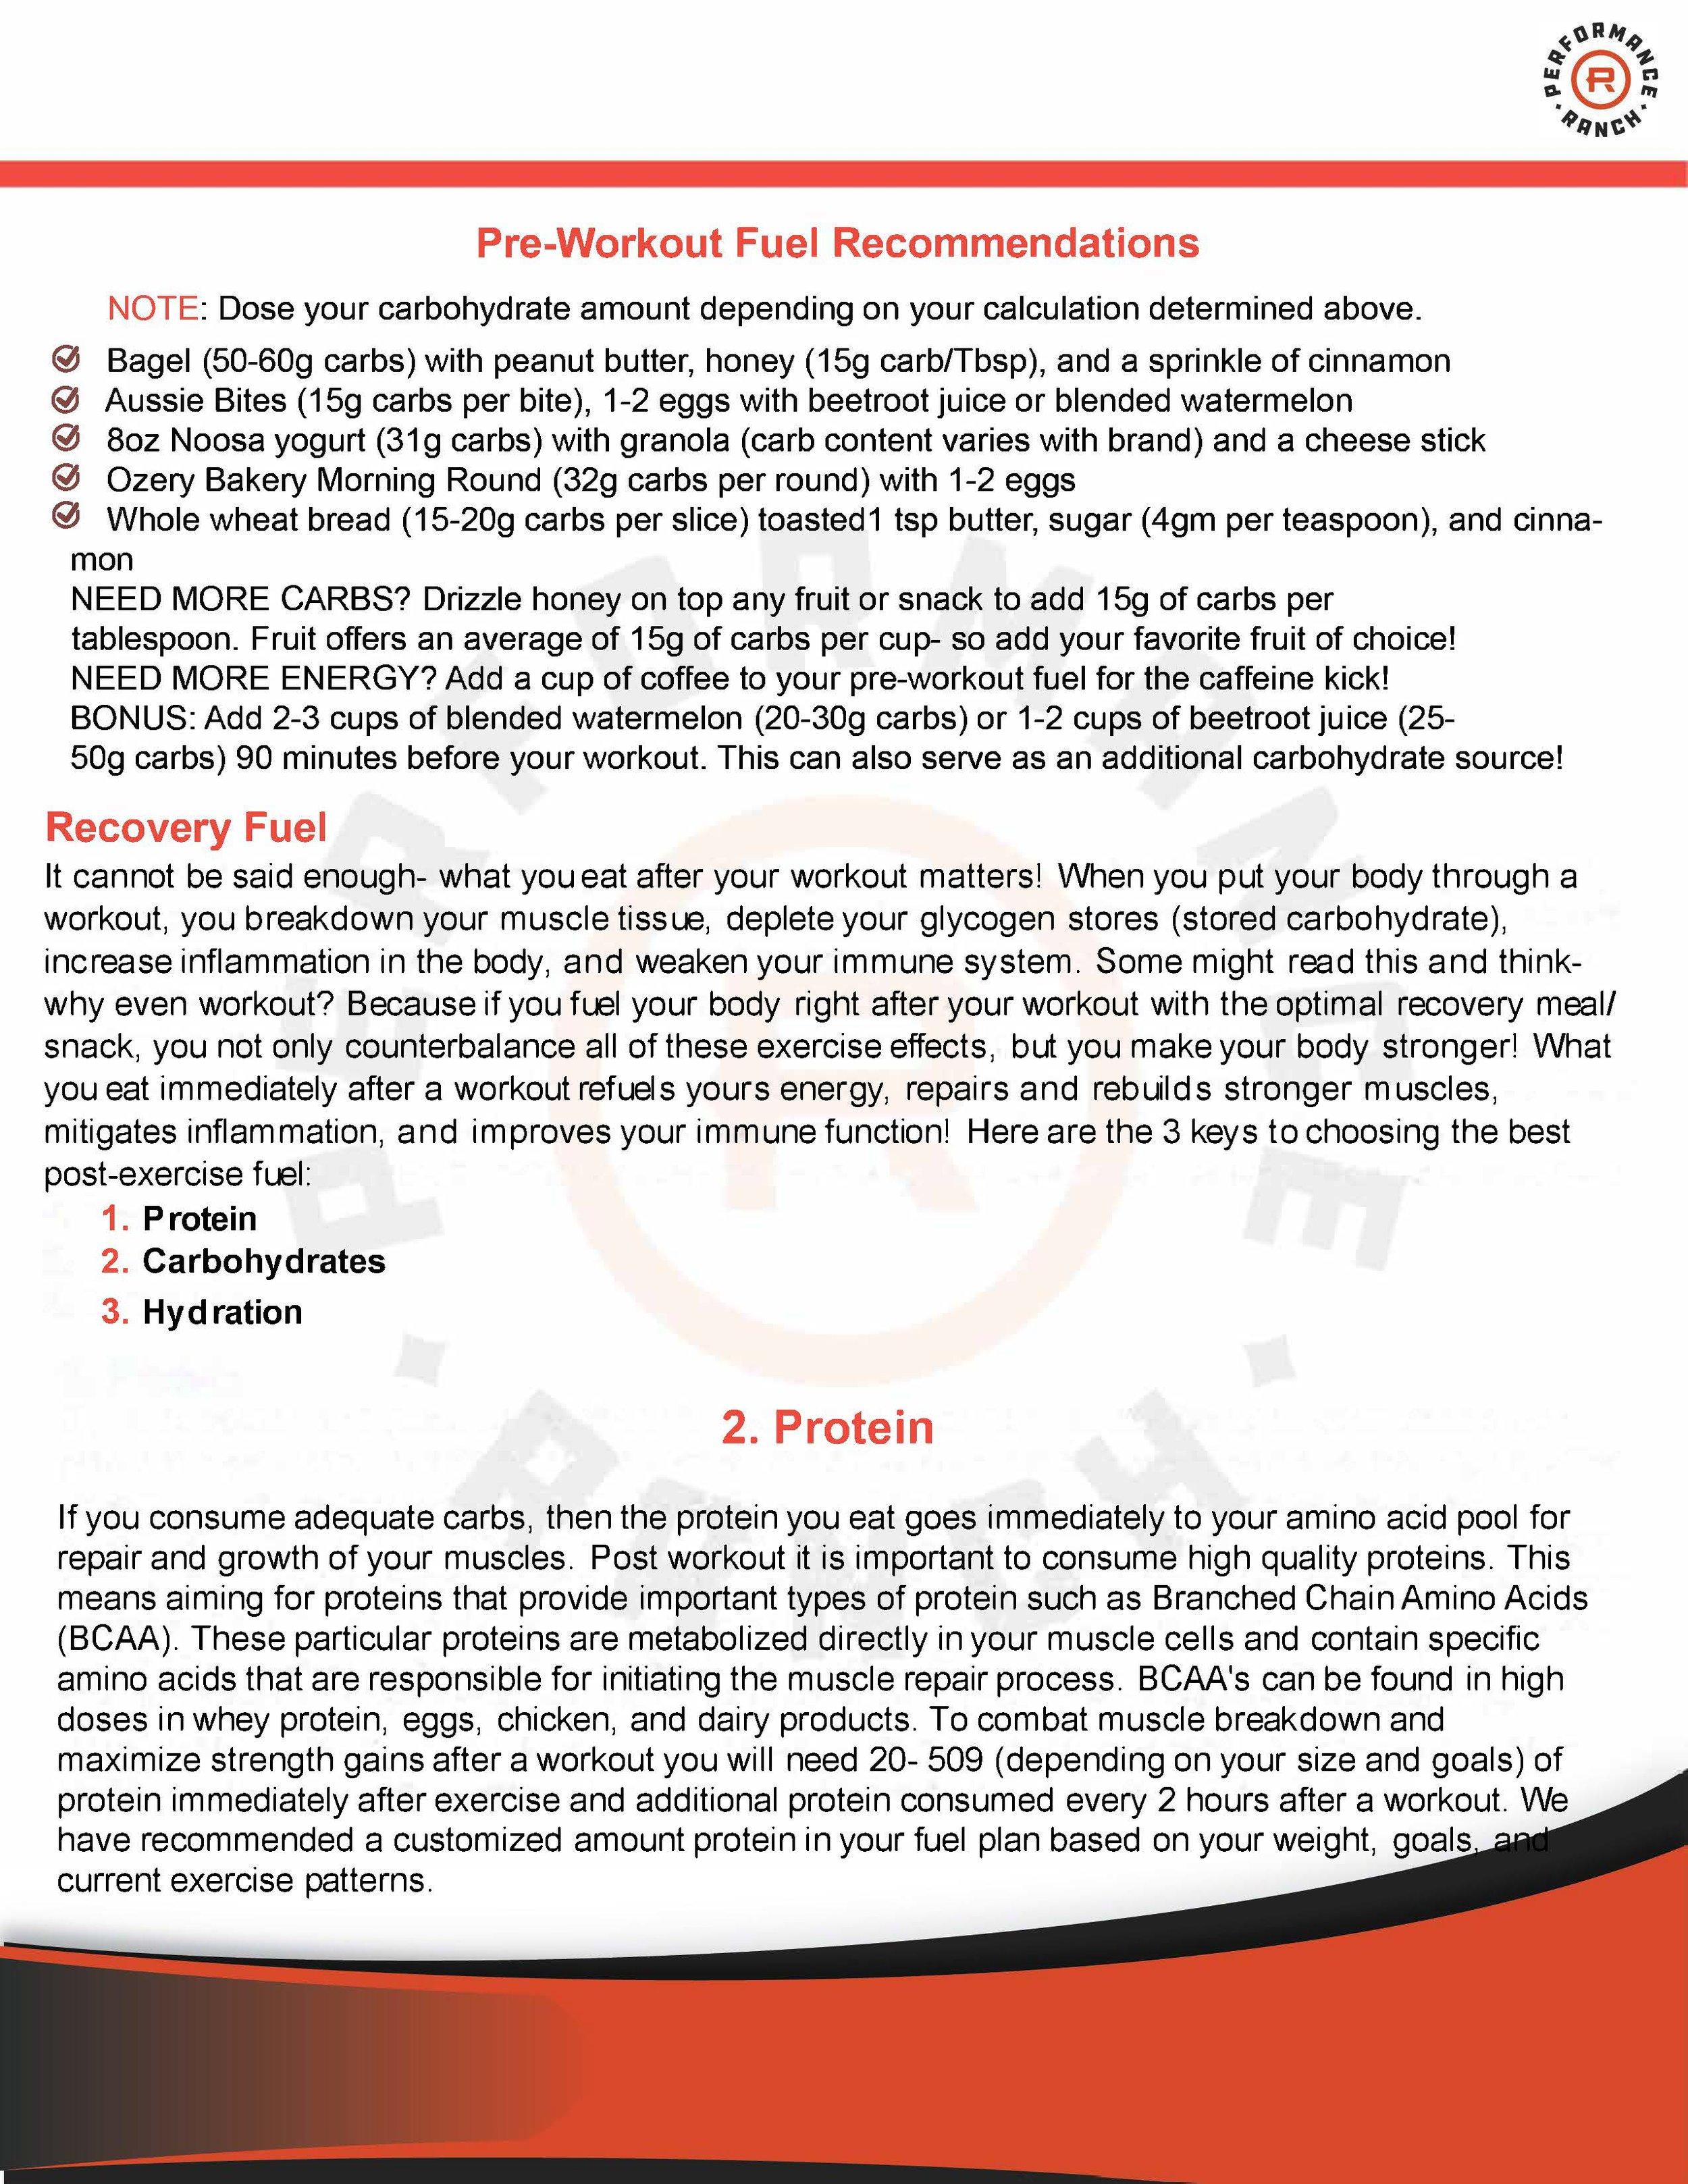 Fuel Plan Education_Page_5.jpg